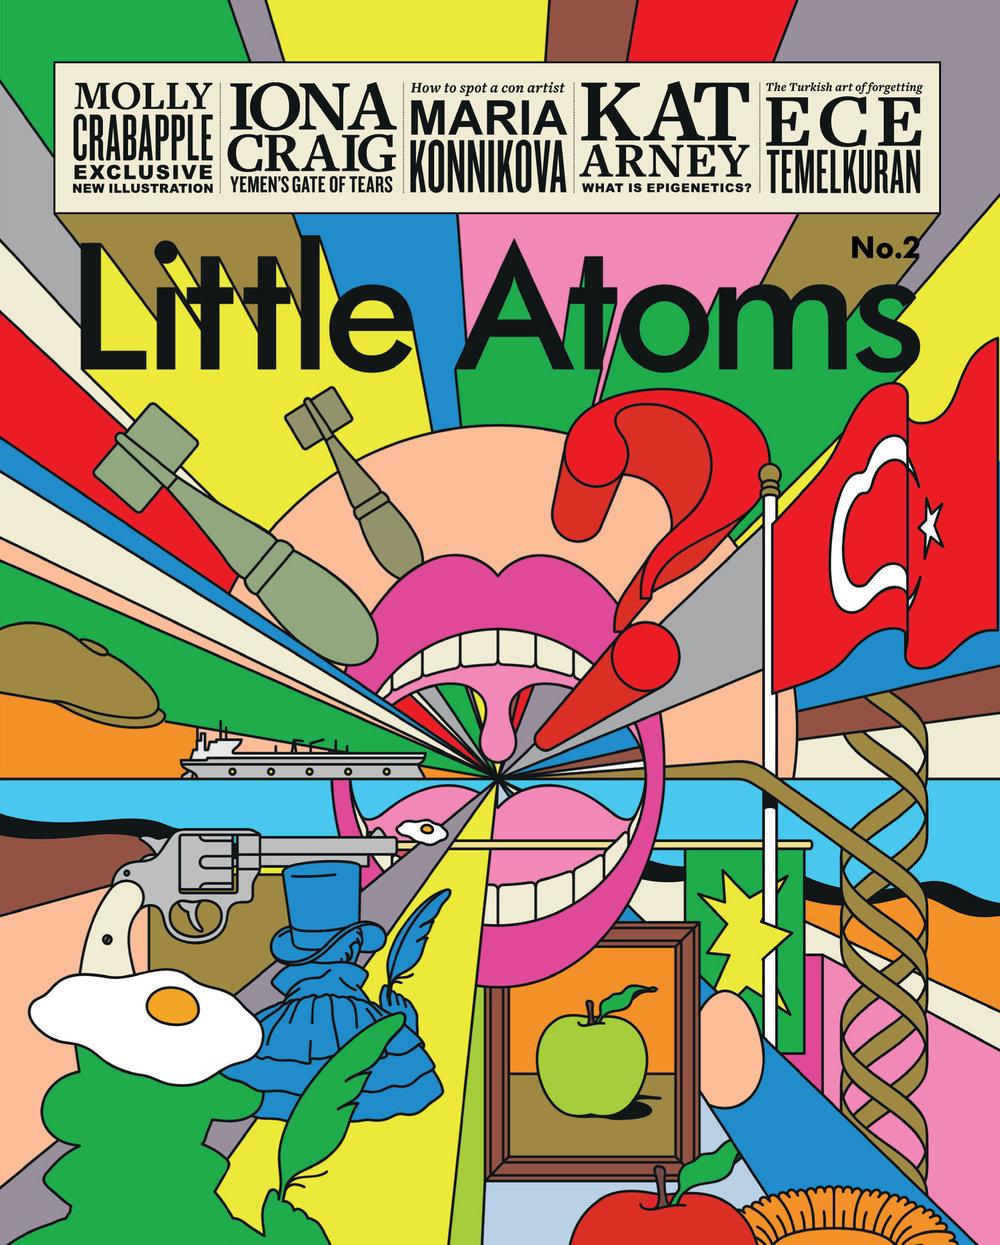 Little Atoms, Issue 2, 2016